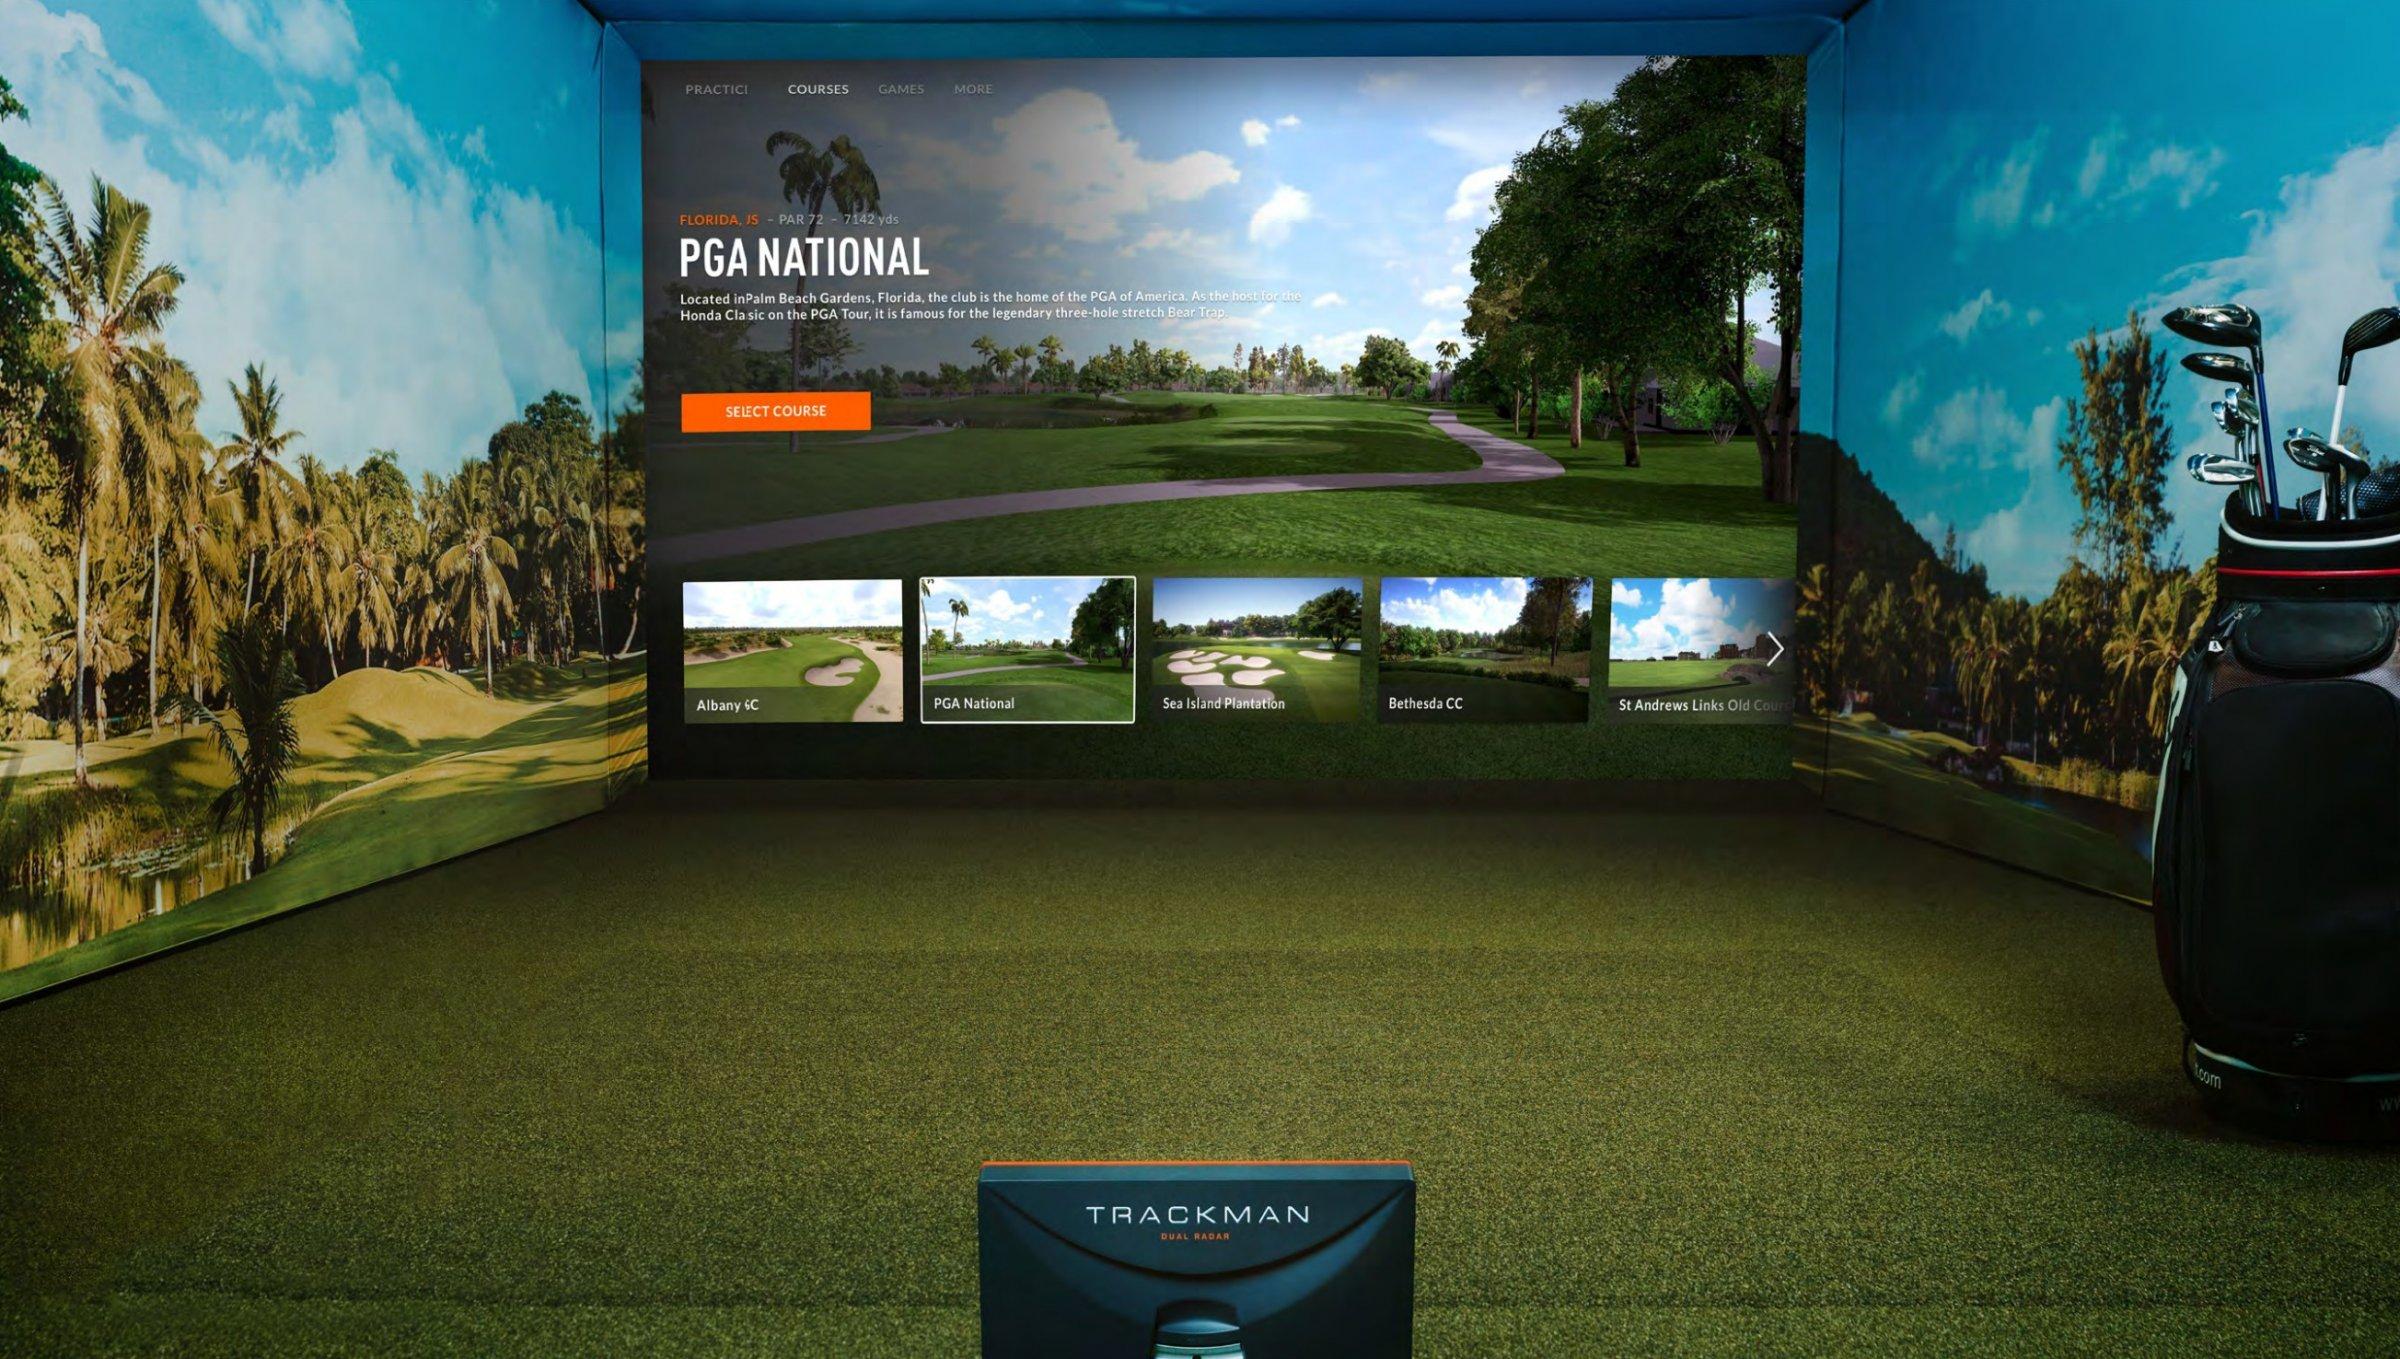 TrackMan indoor golf simulator